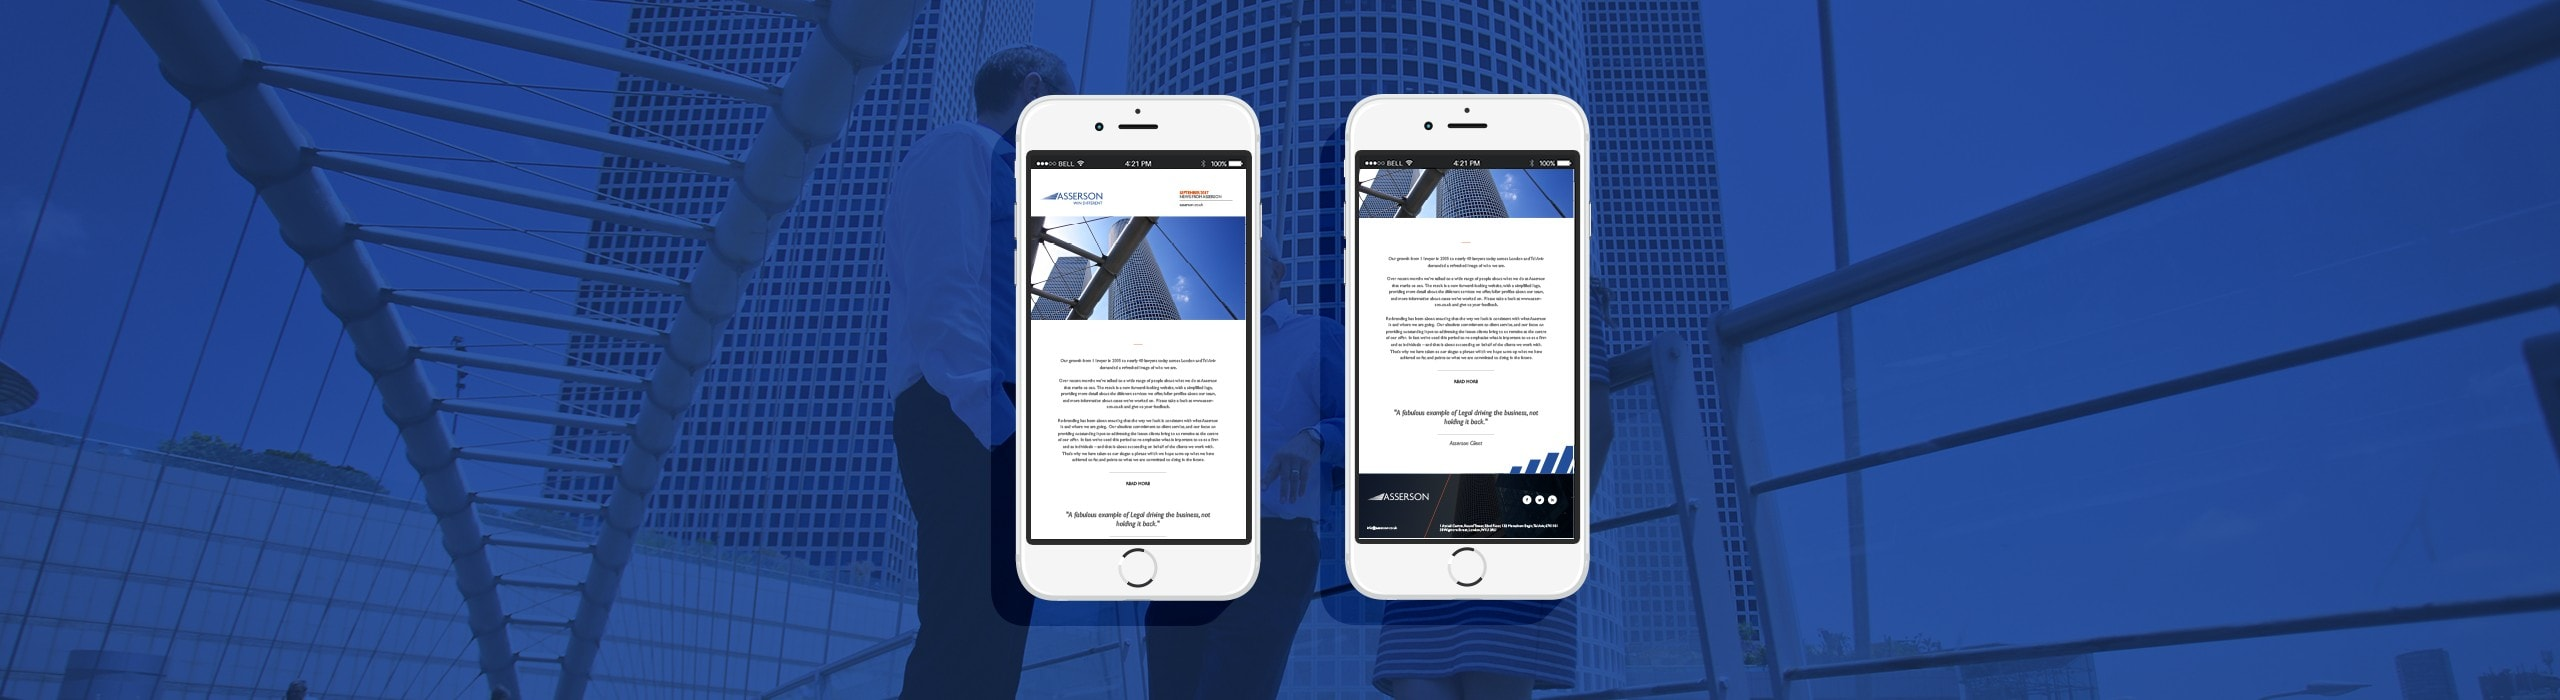 Asserson - natie-asserson-mobile - Natie Branding Agency